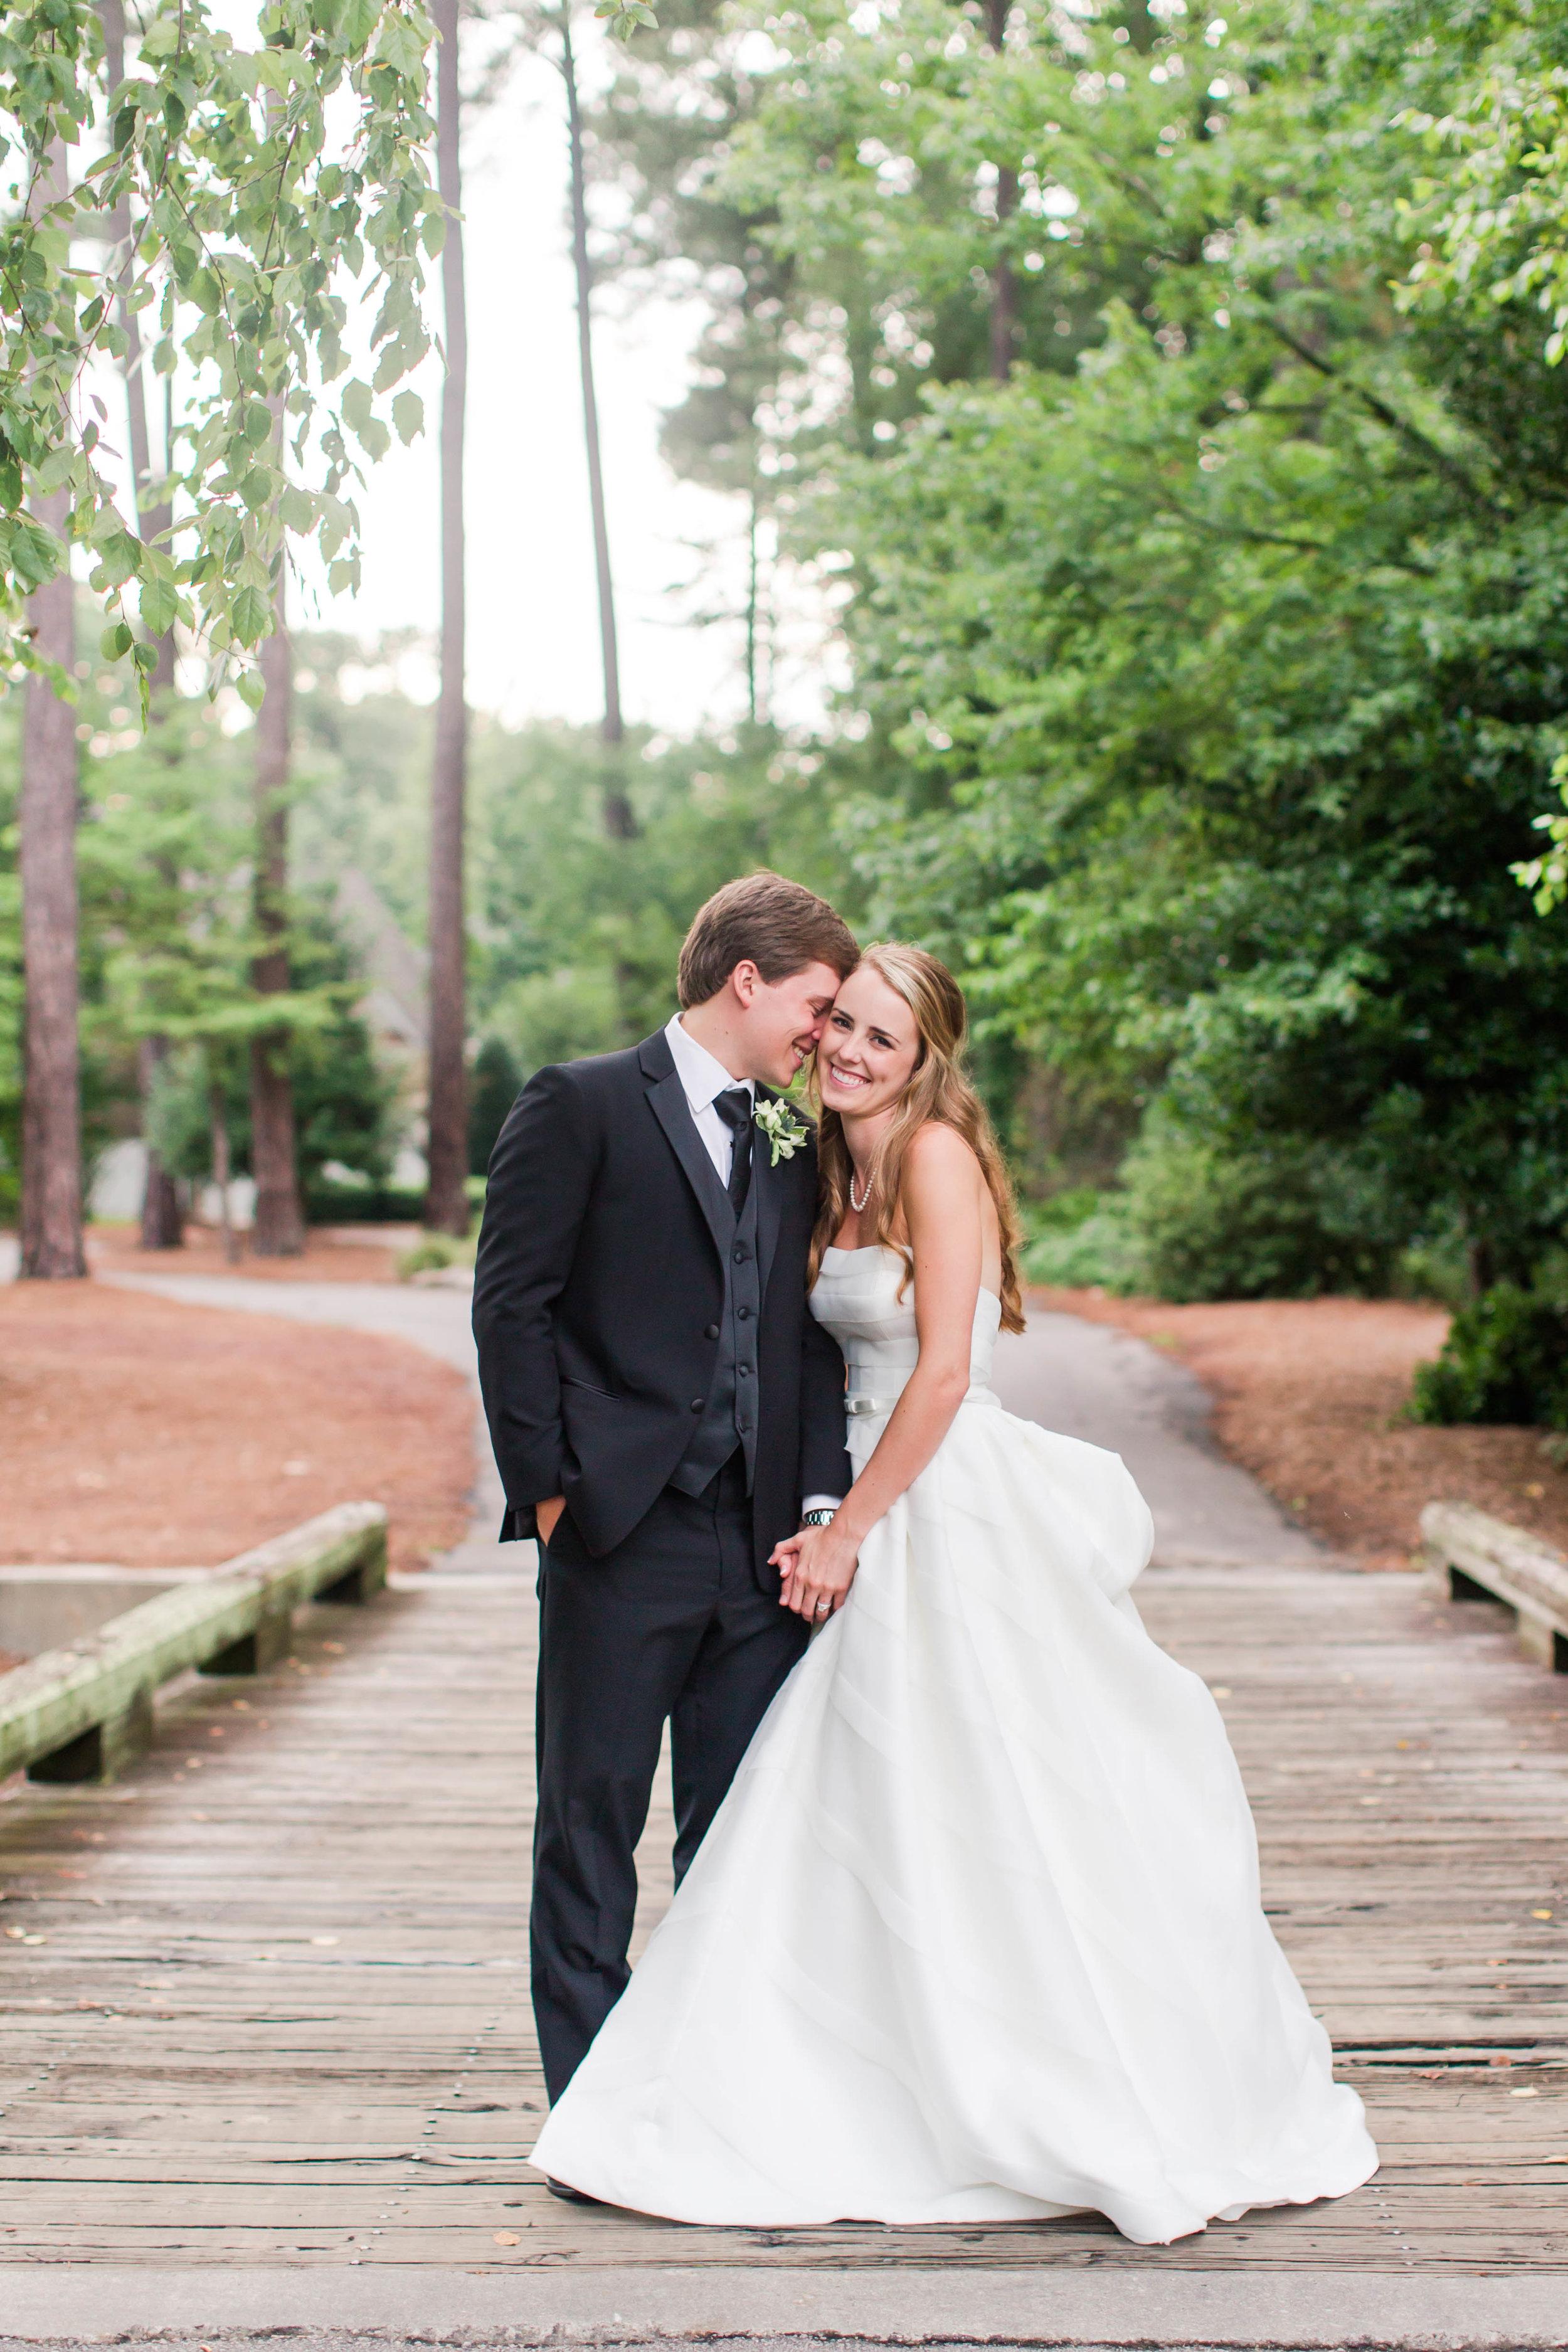 Stone_Bride and Groom_167.jpg